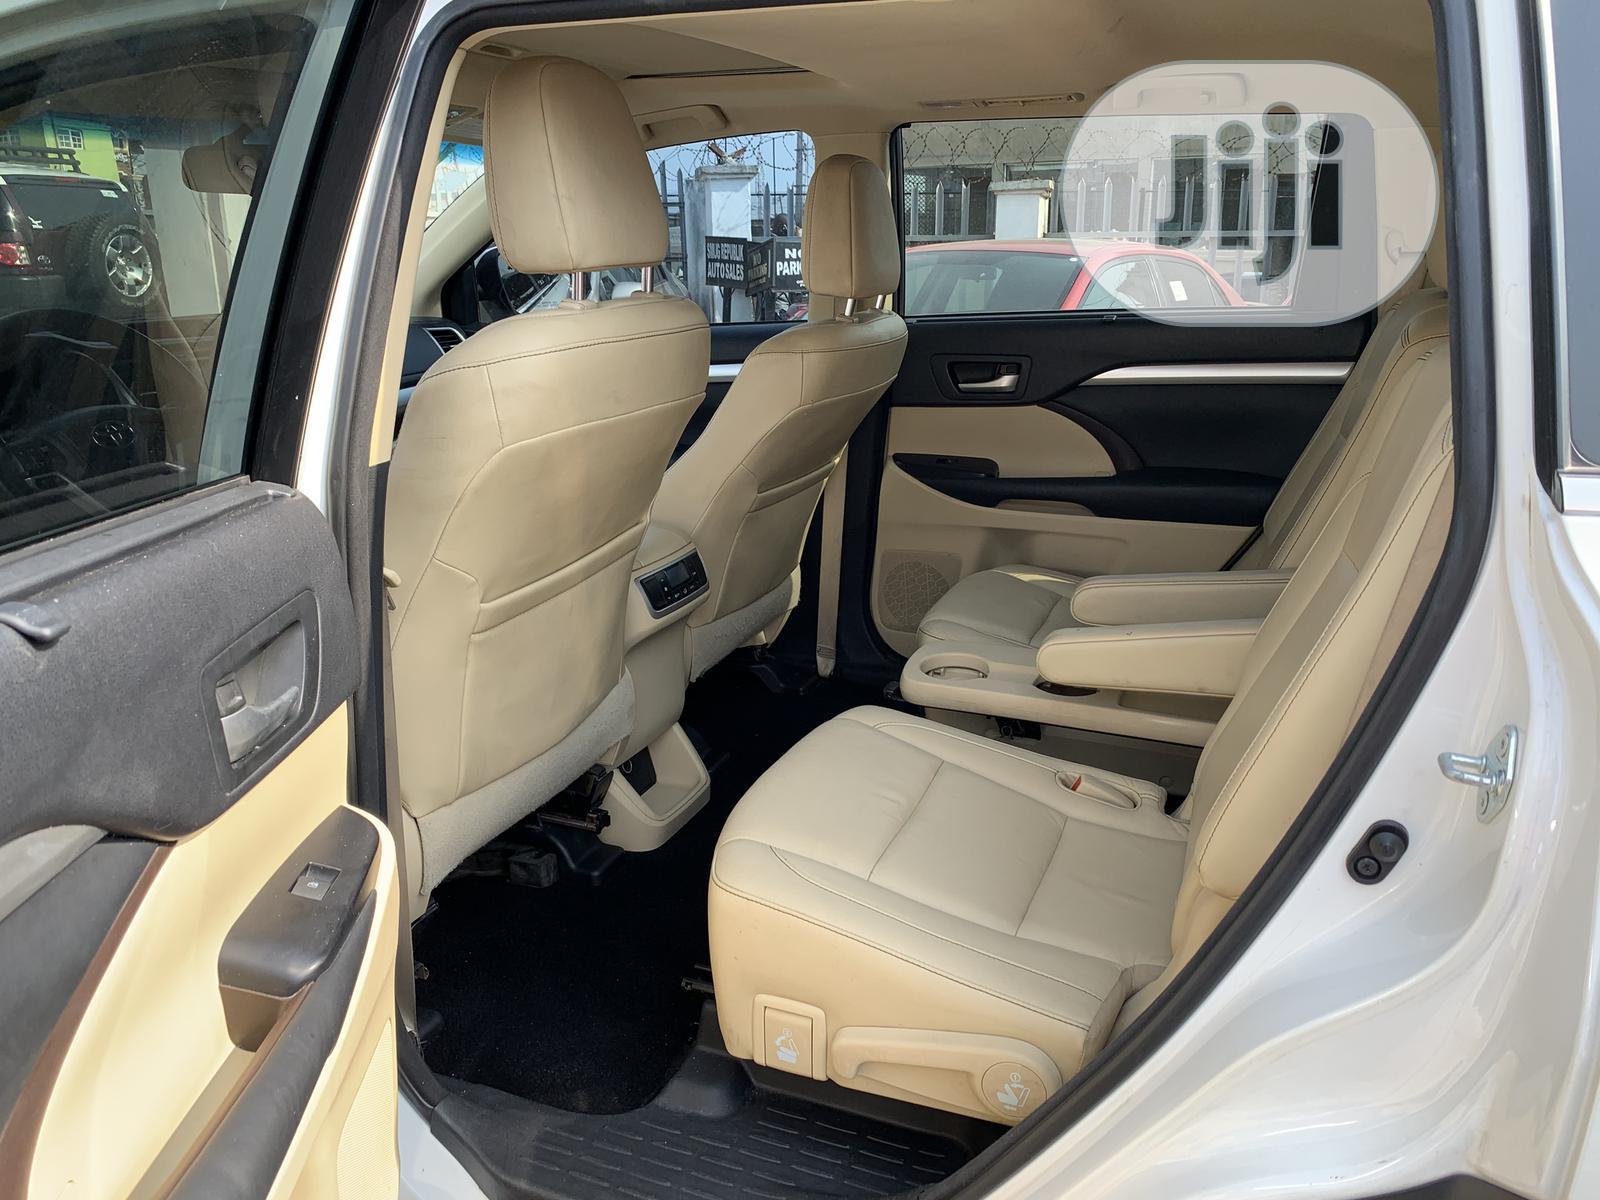 Toyota Highlander 2015 White | Cars for sale in Amuwo-Odofin, Lagos State, Nigeria